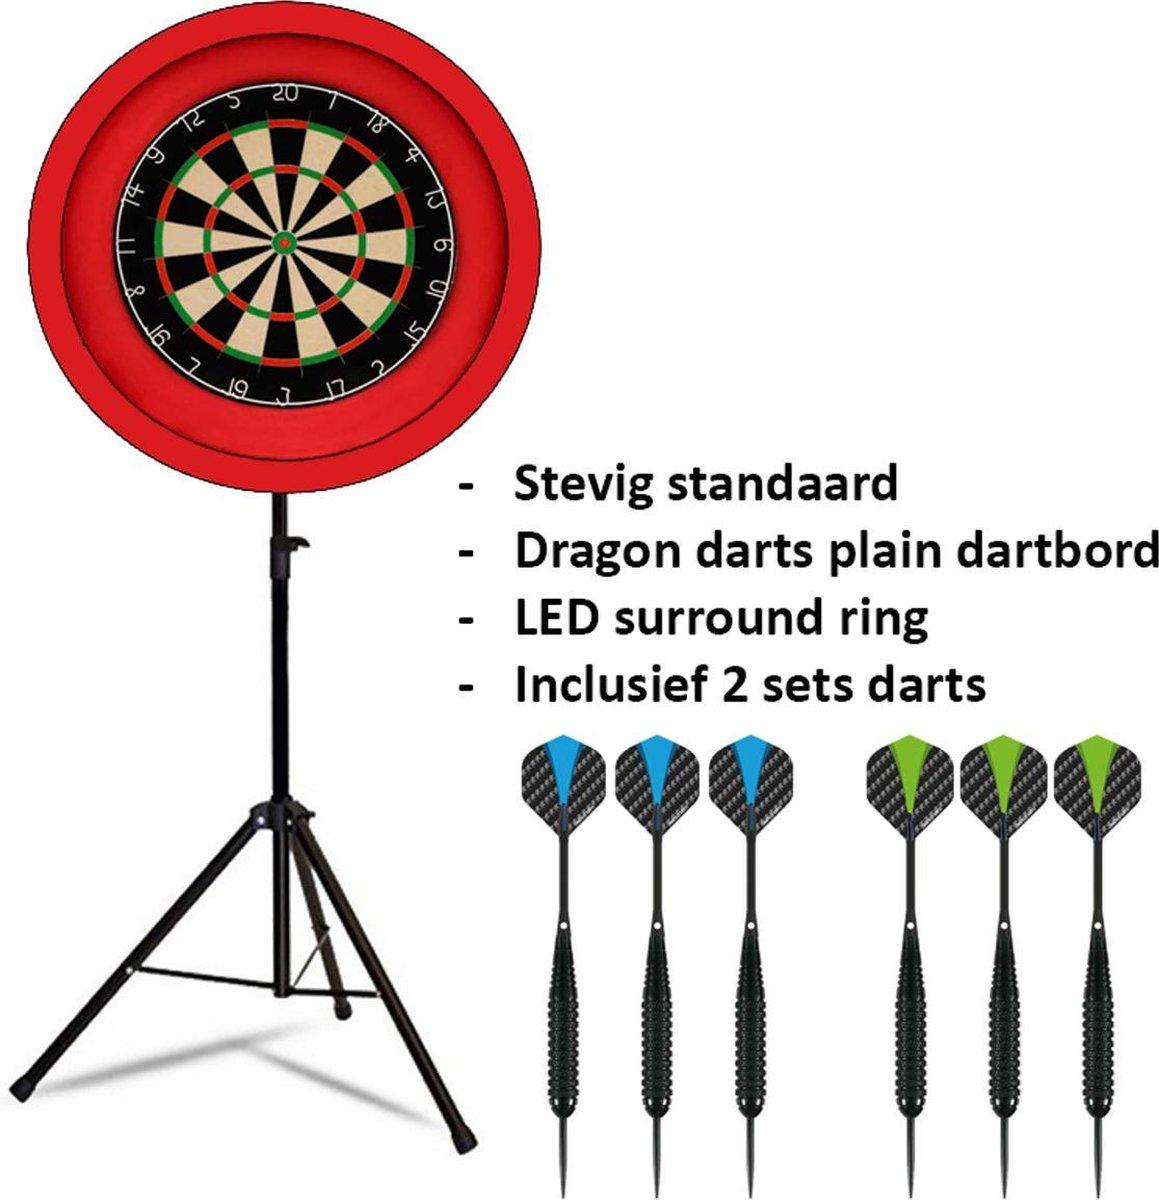 Dragon darts - Portable dartbord standaard LED pakket plus - inclusief best geteste - dartbord - LED surround ring - en - dartpijlen - rood